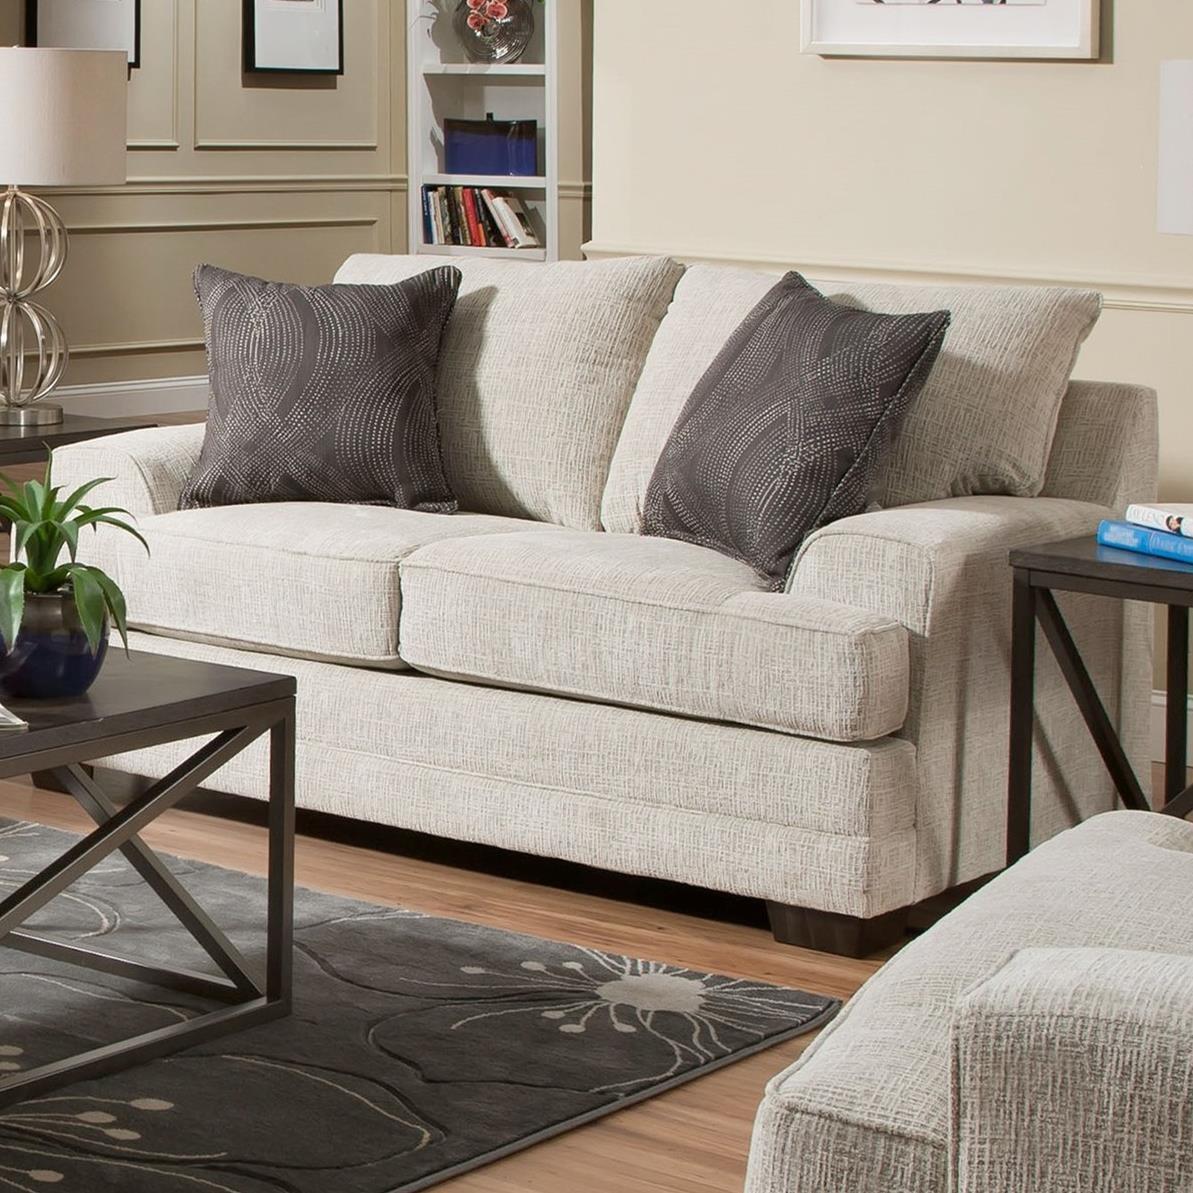 6548BR Love Seat by United Furniture Industries at Bullard Furniture